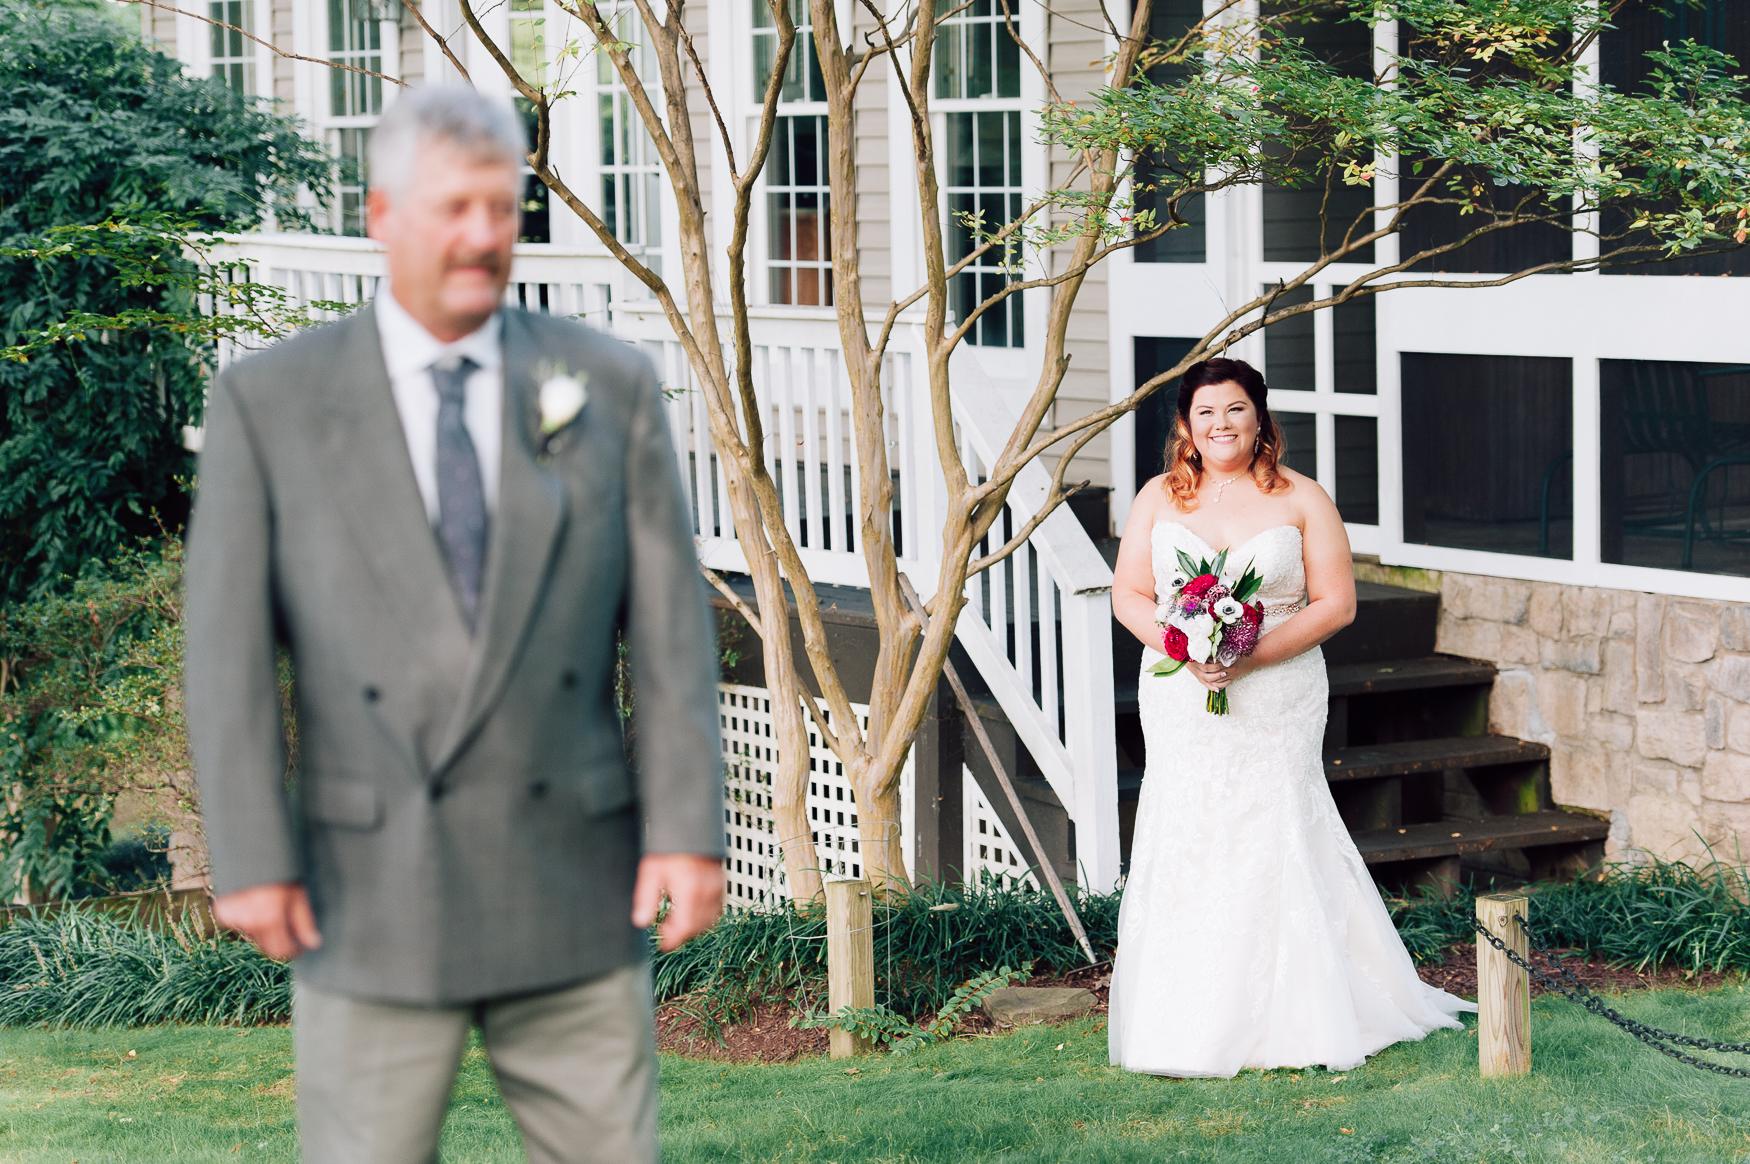 virginiawedding_GlenGarden_rusticwedding_fredericksburg_youseephotography_KellySteven (17).jpg